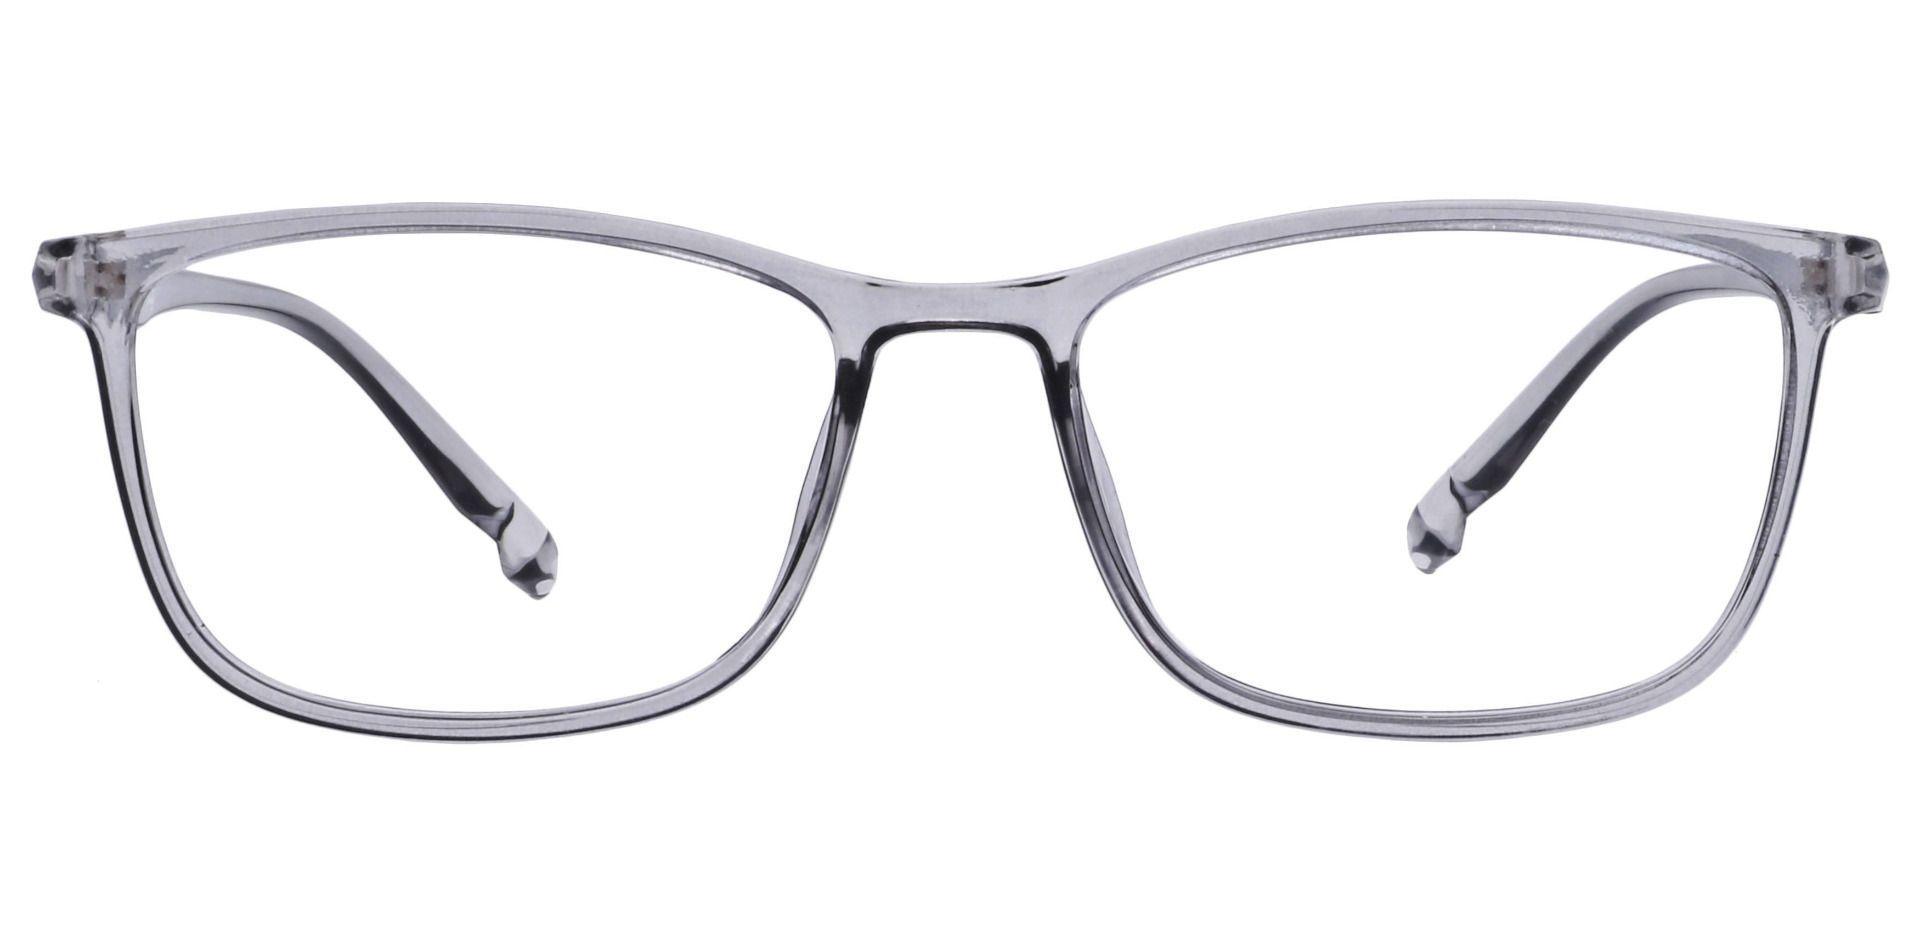 Harvest Rectangle Non-Rx Glasses - Gray